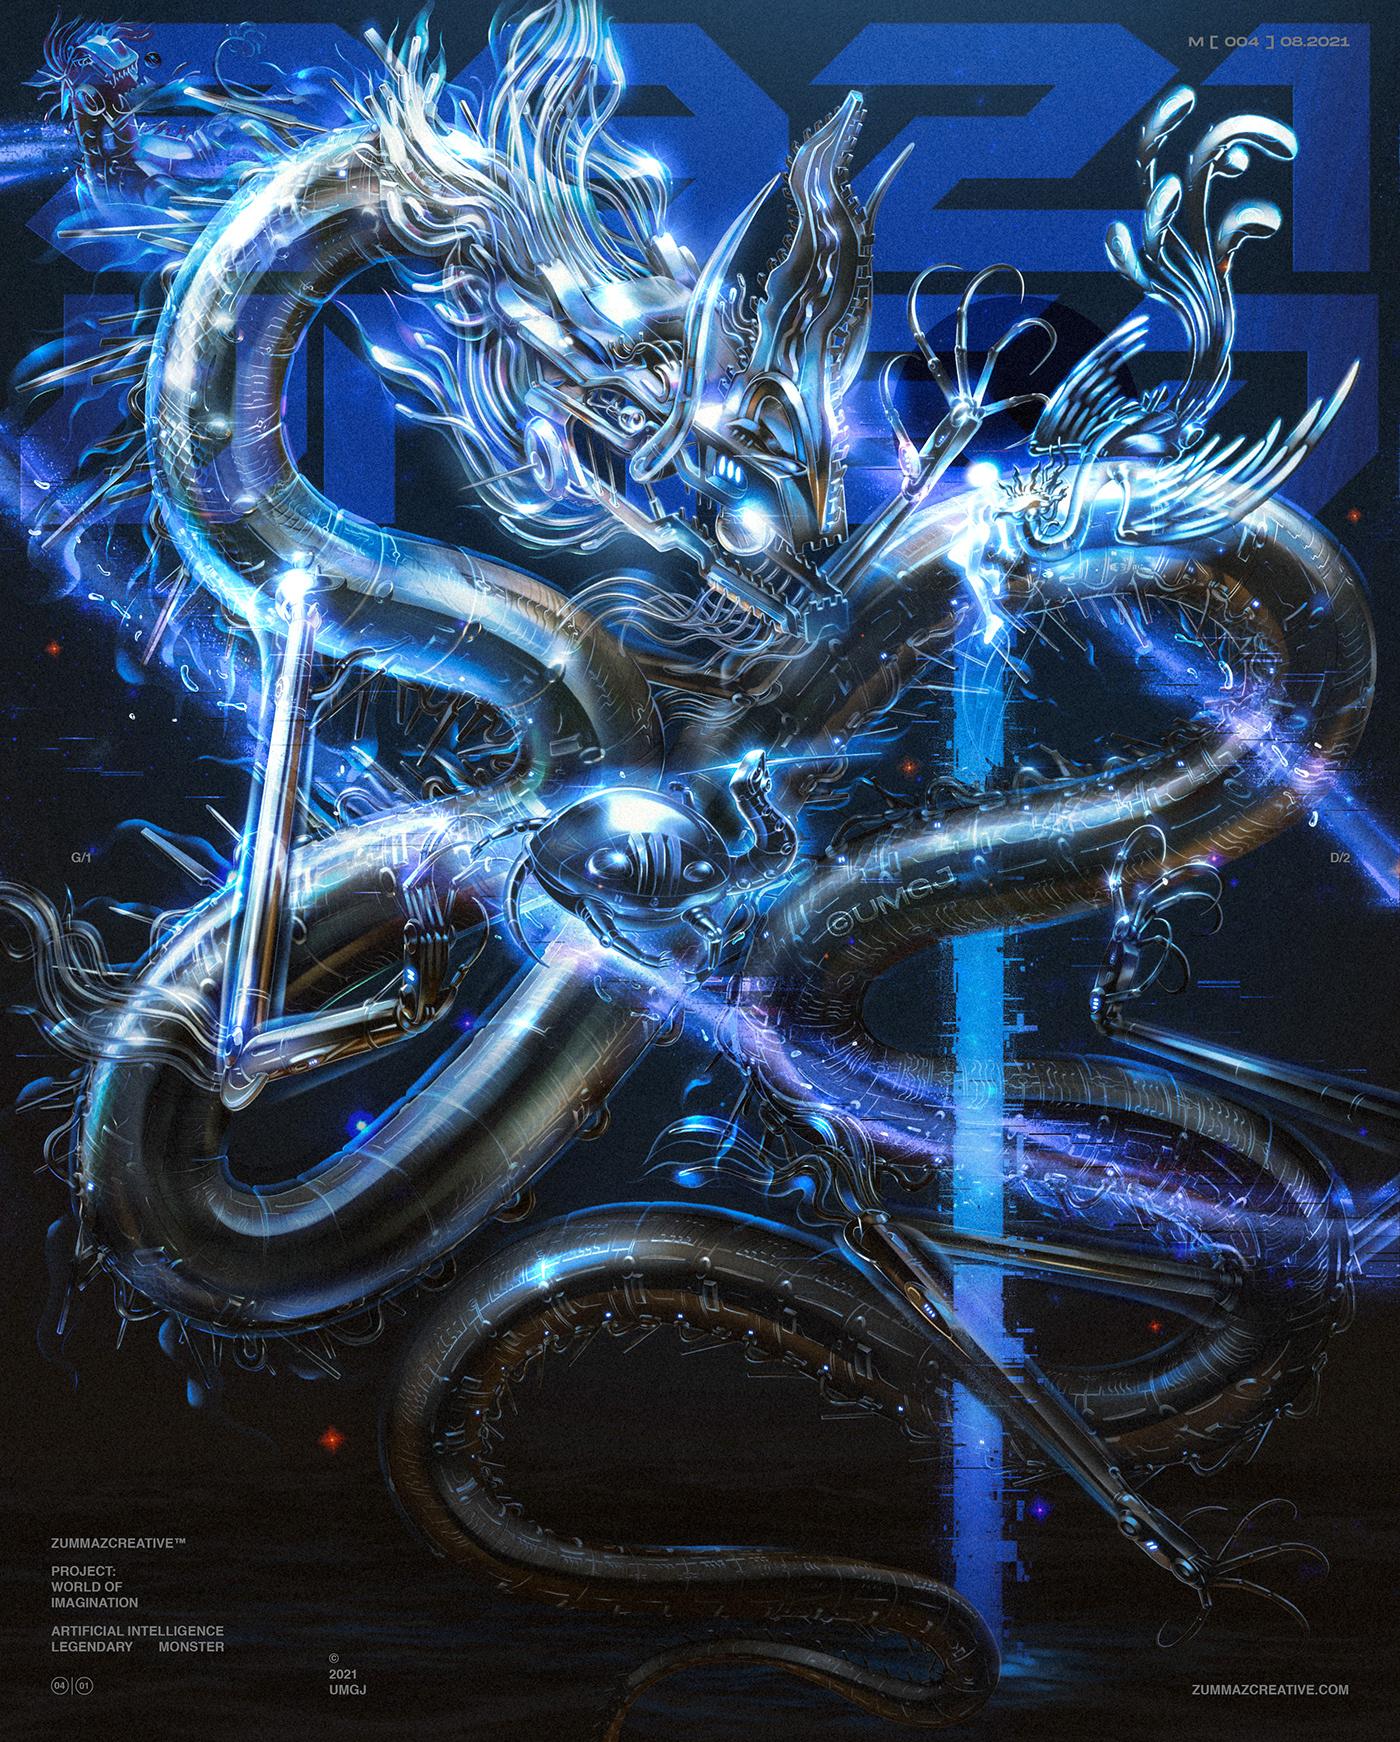 artwork Cyberpunk Cyborg Digital Art  dragon ILLUSTRATION  Scifi streetwear surreal umgj